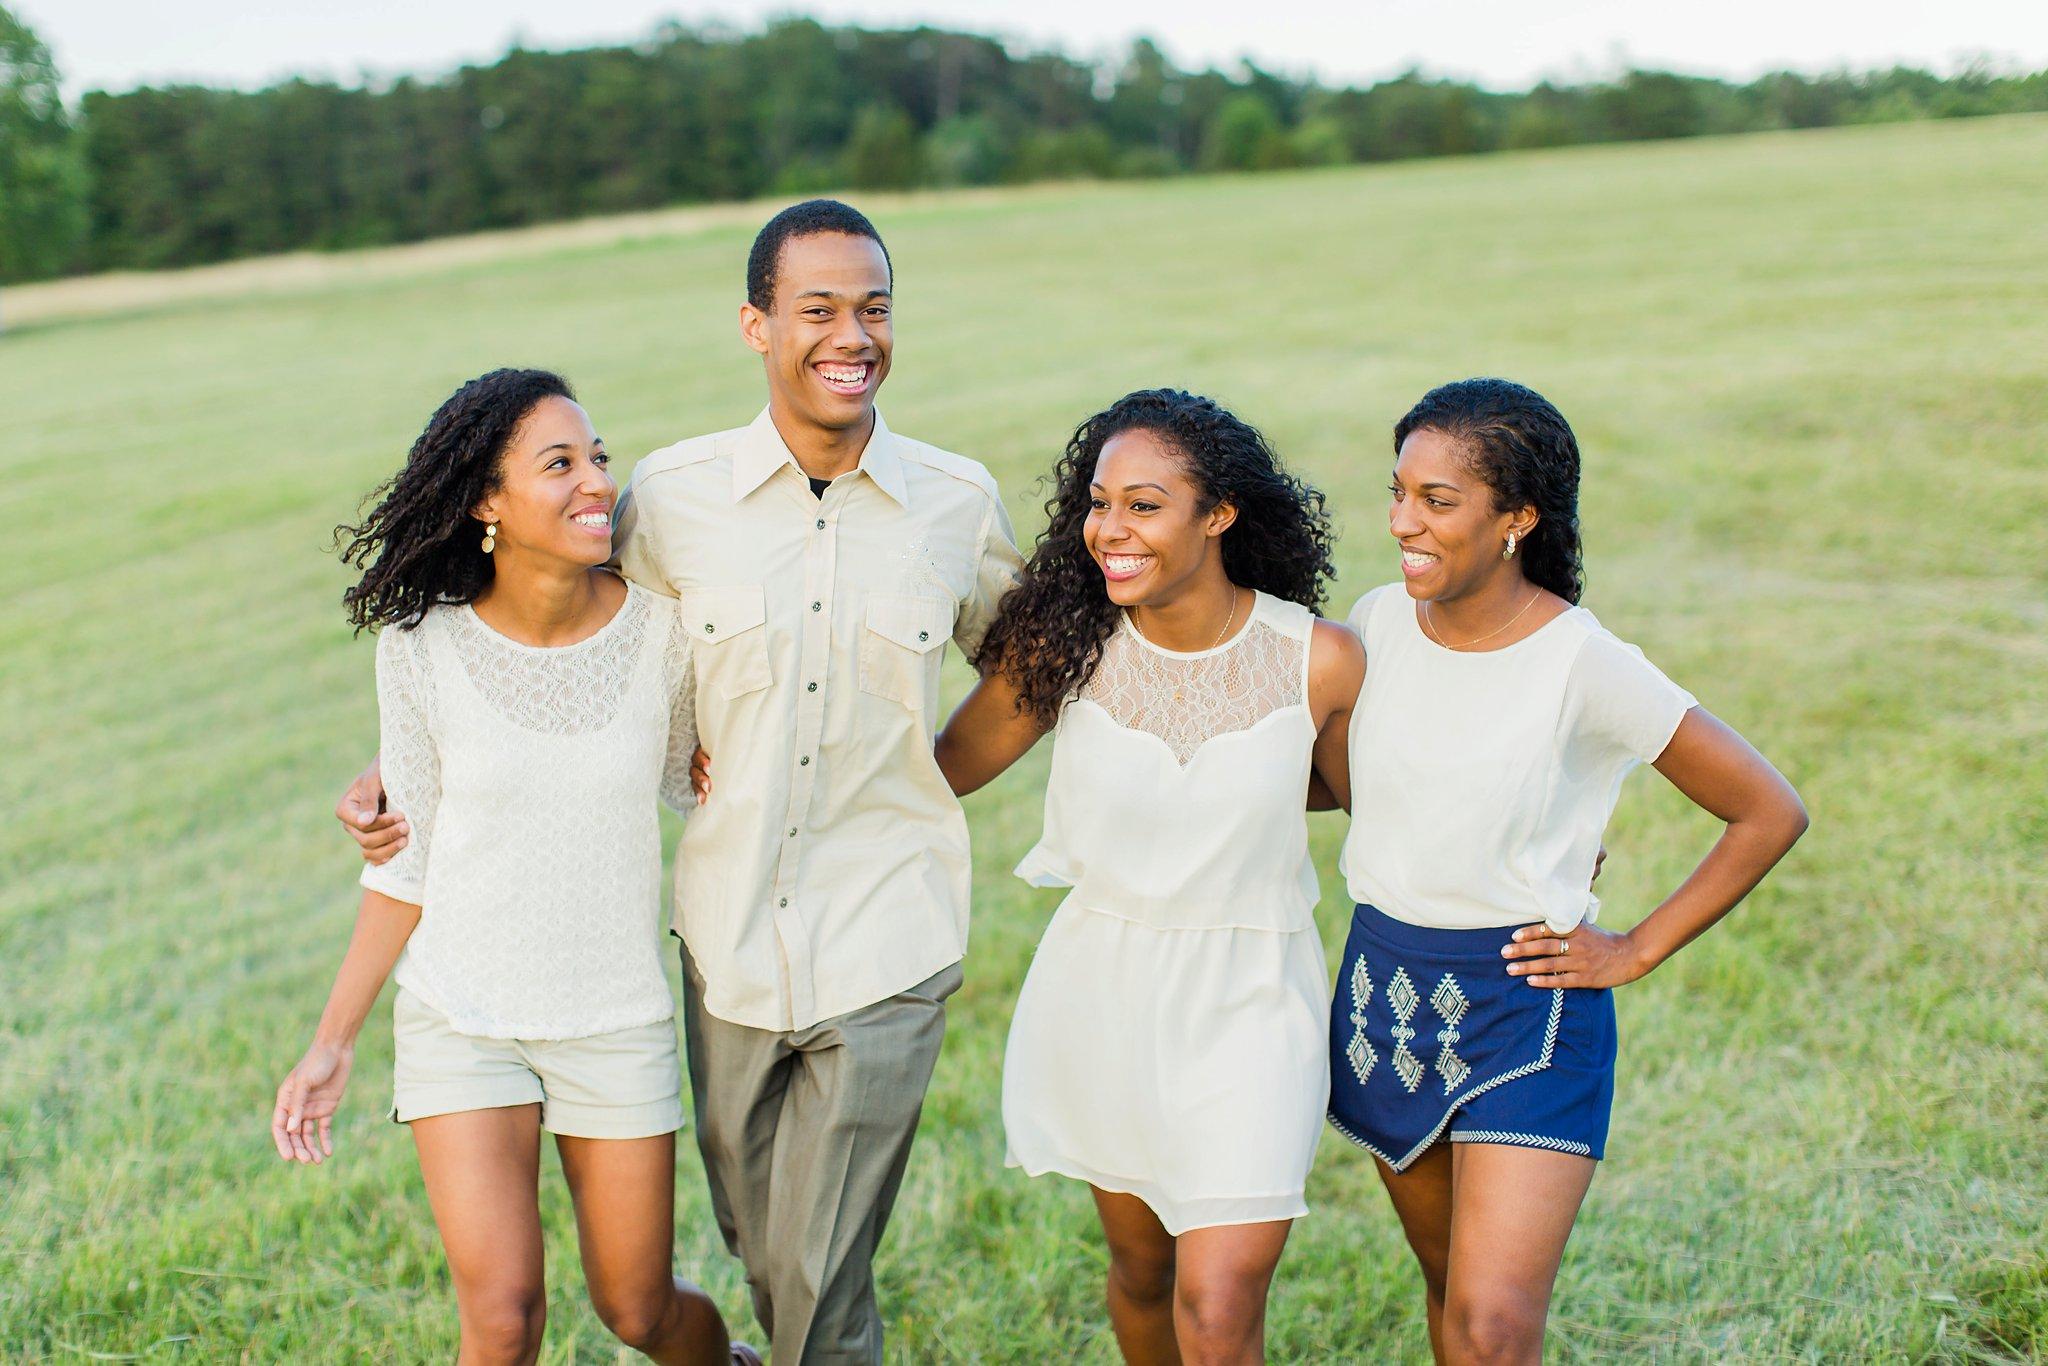 Manassas Battlefield Family Photos Northern Virginia Family Photographer Megan Kelsey Photography-8211.jpg